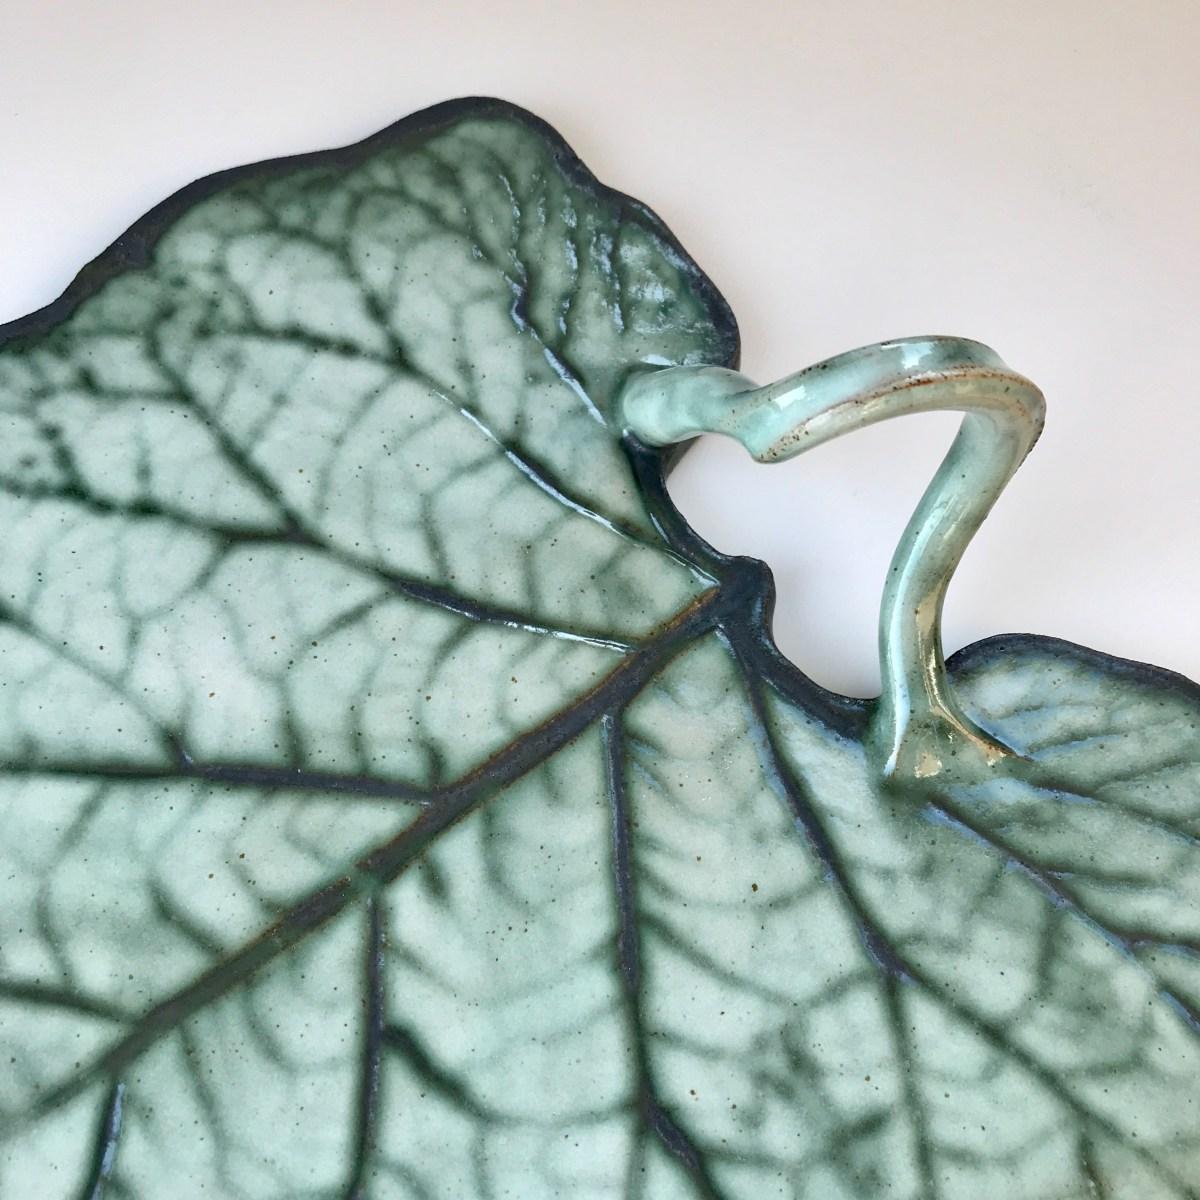 Burdock Leaf Sharing Platter by Sonya Ceramic Art (Detail View 2)